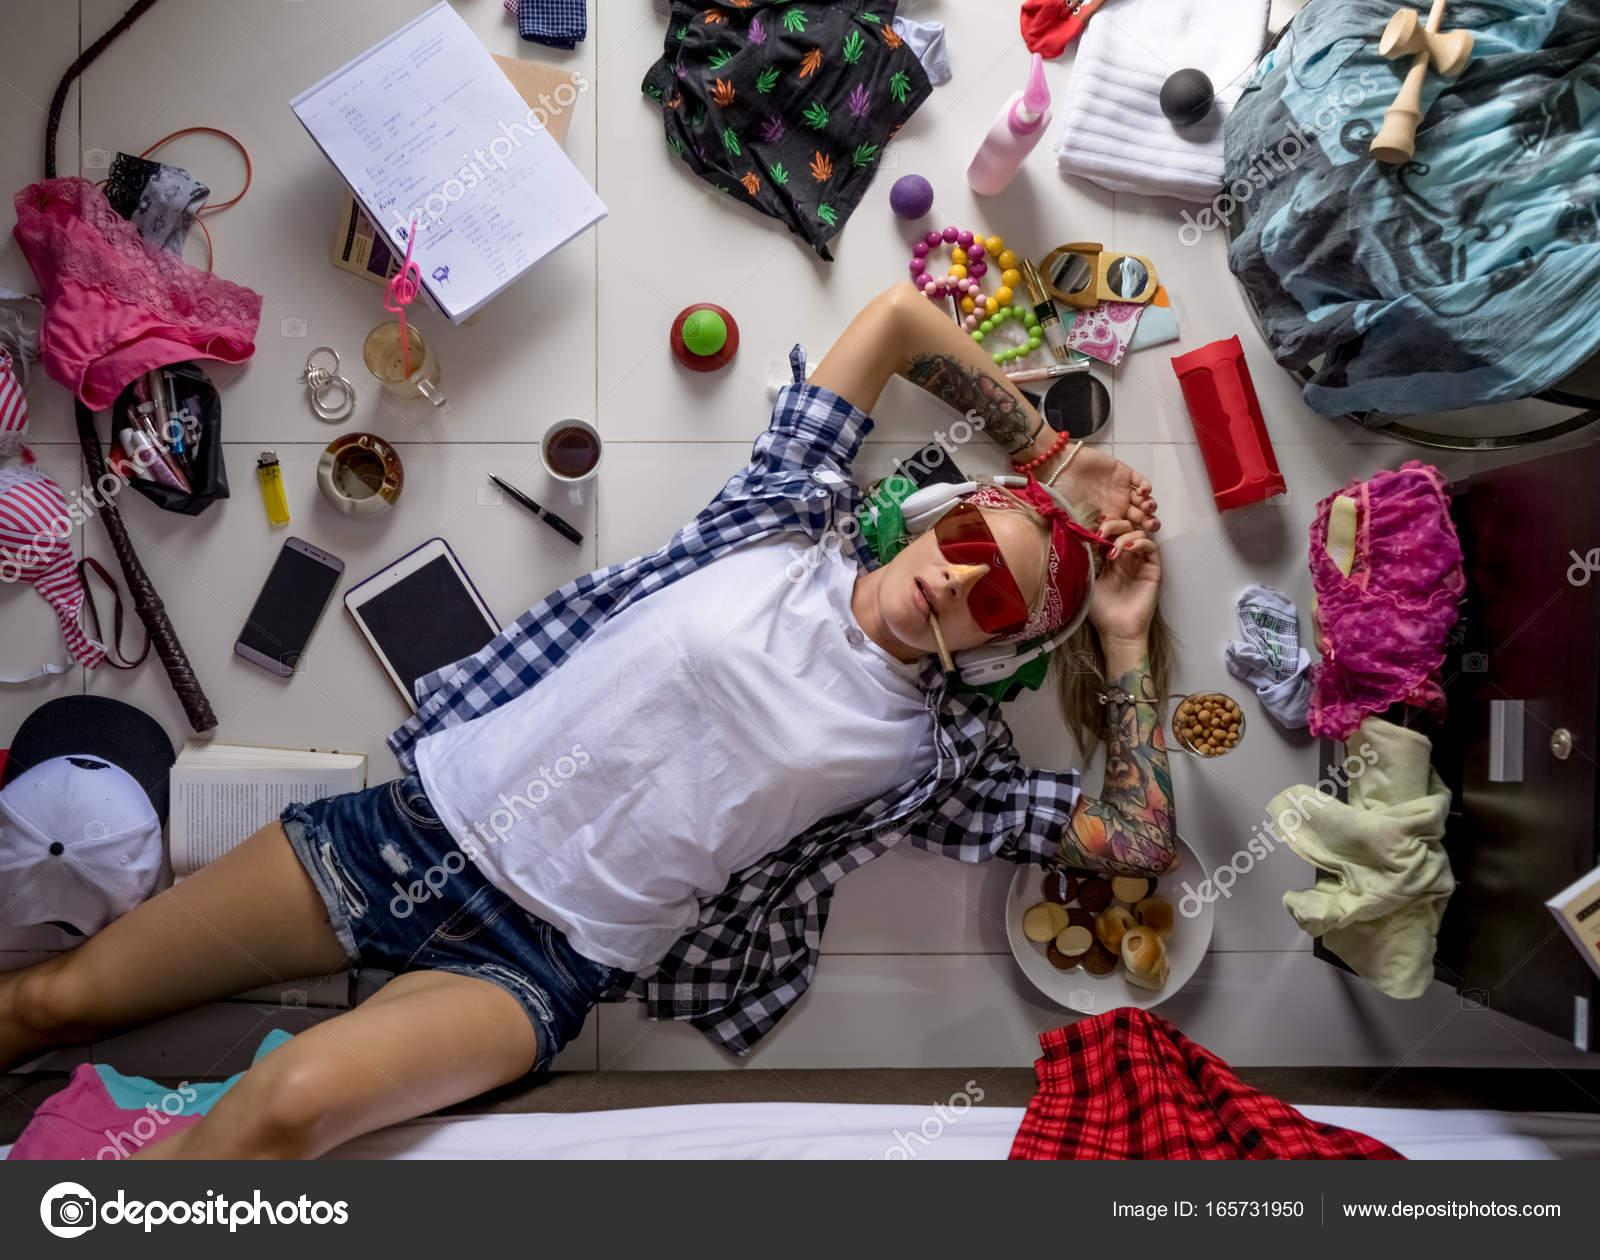 https://st3.depositphotos.com/12678458/16573/i/1600/depositphotos_165731950-stock-photo-student-girl-in-a-plaid.jpg